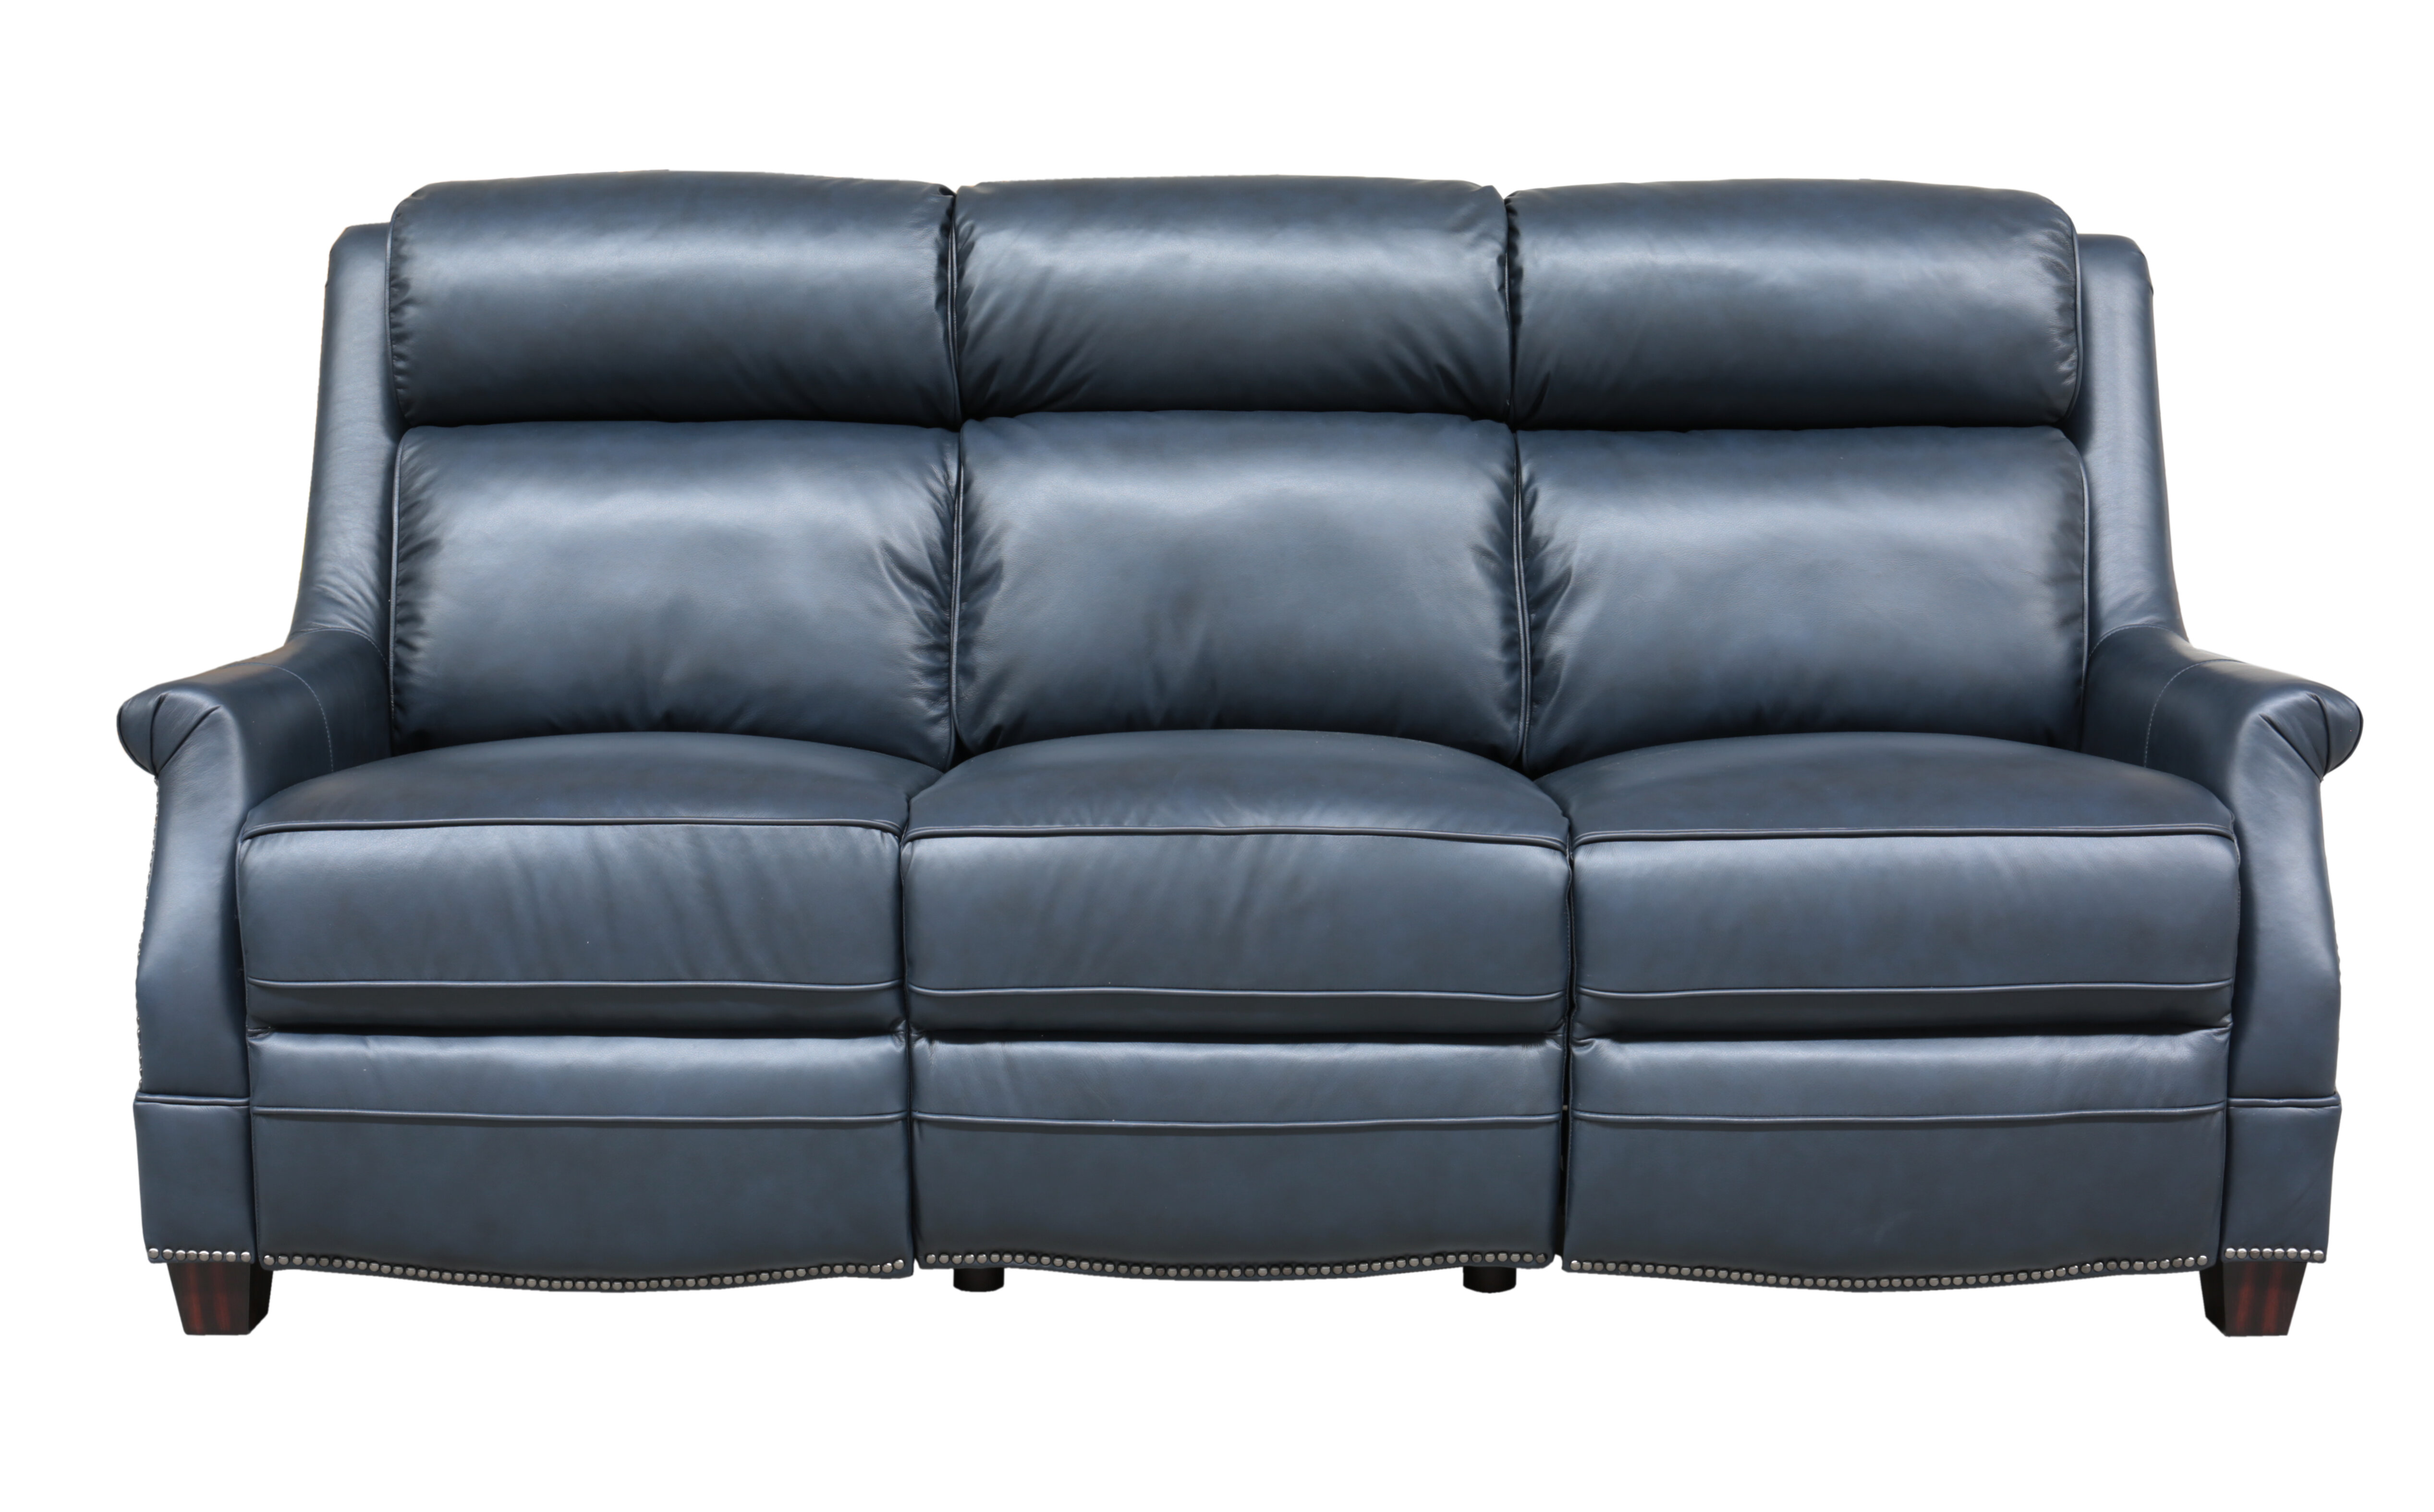 Orren Ellis Cheadle Genuine Leather